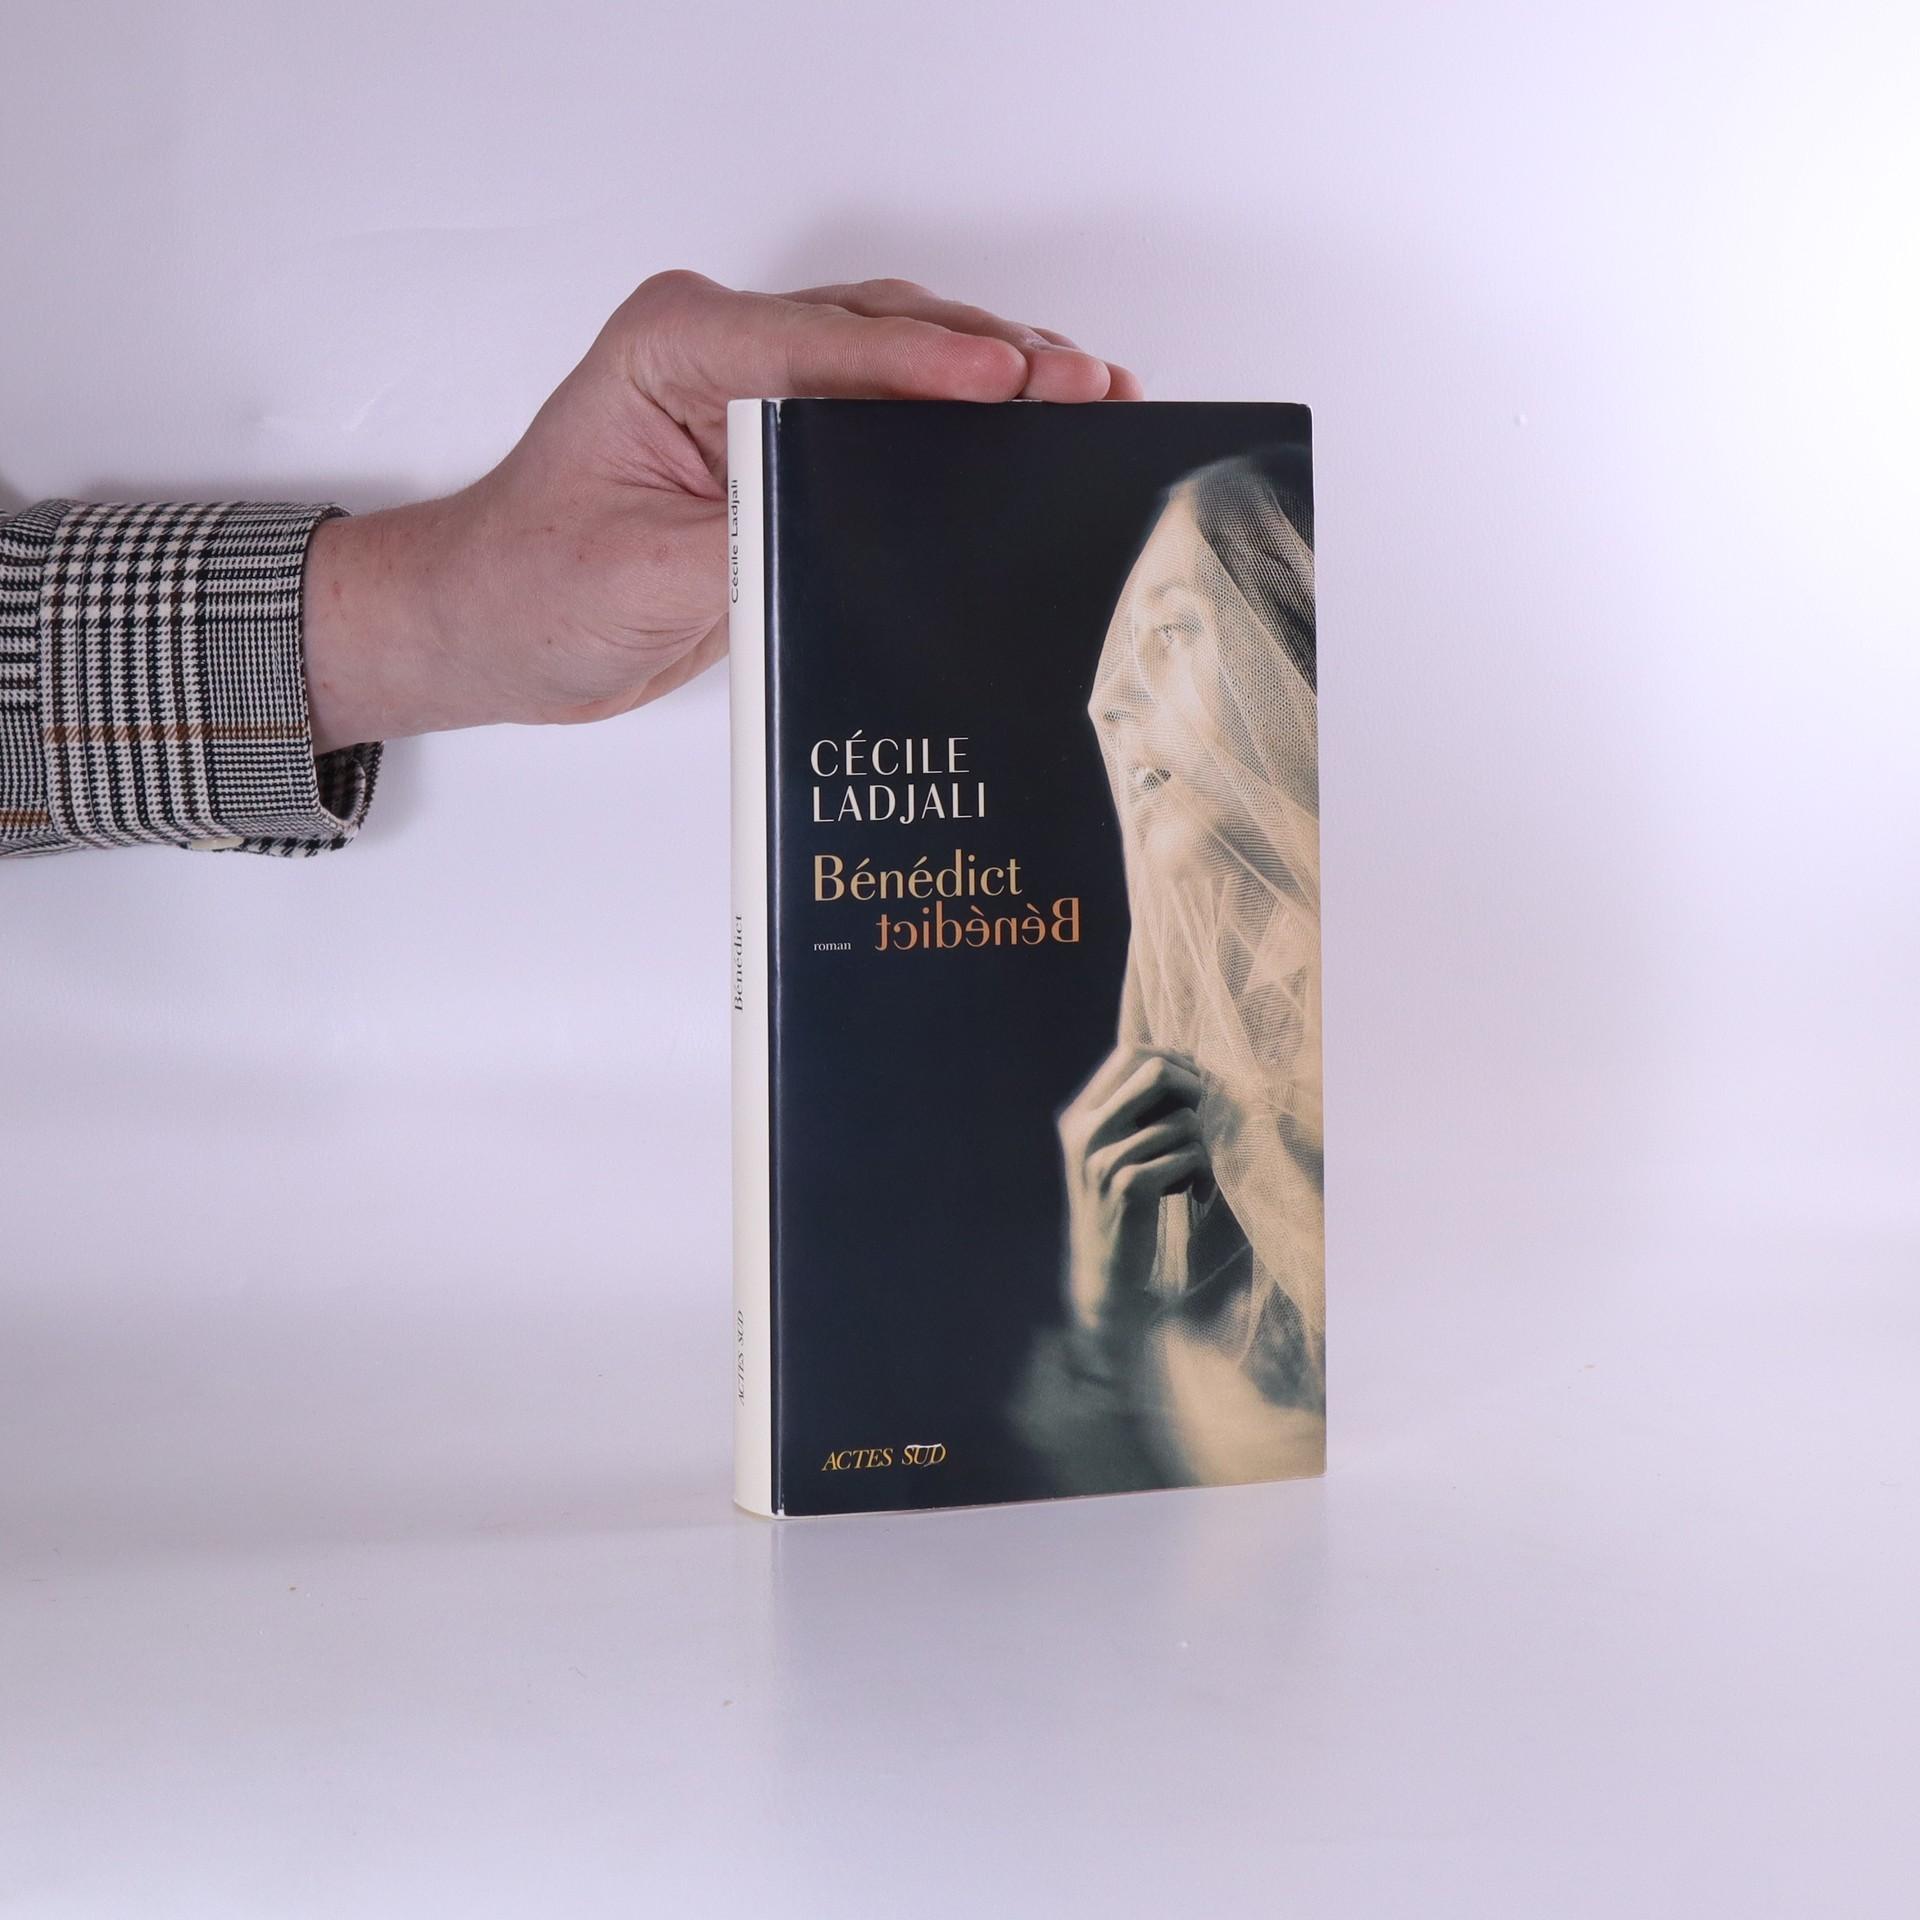 antikvární kniha Bénédict, 2018